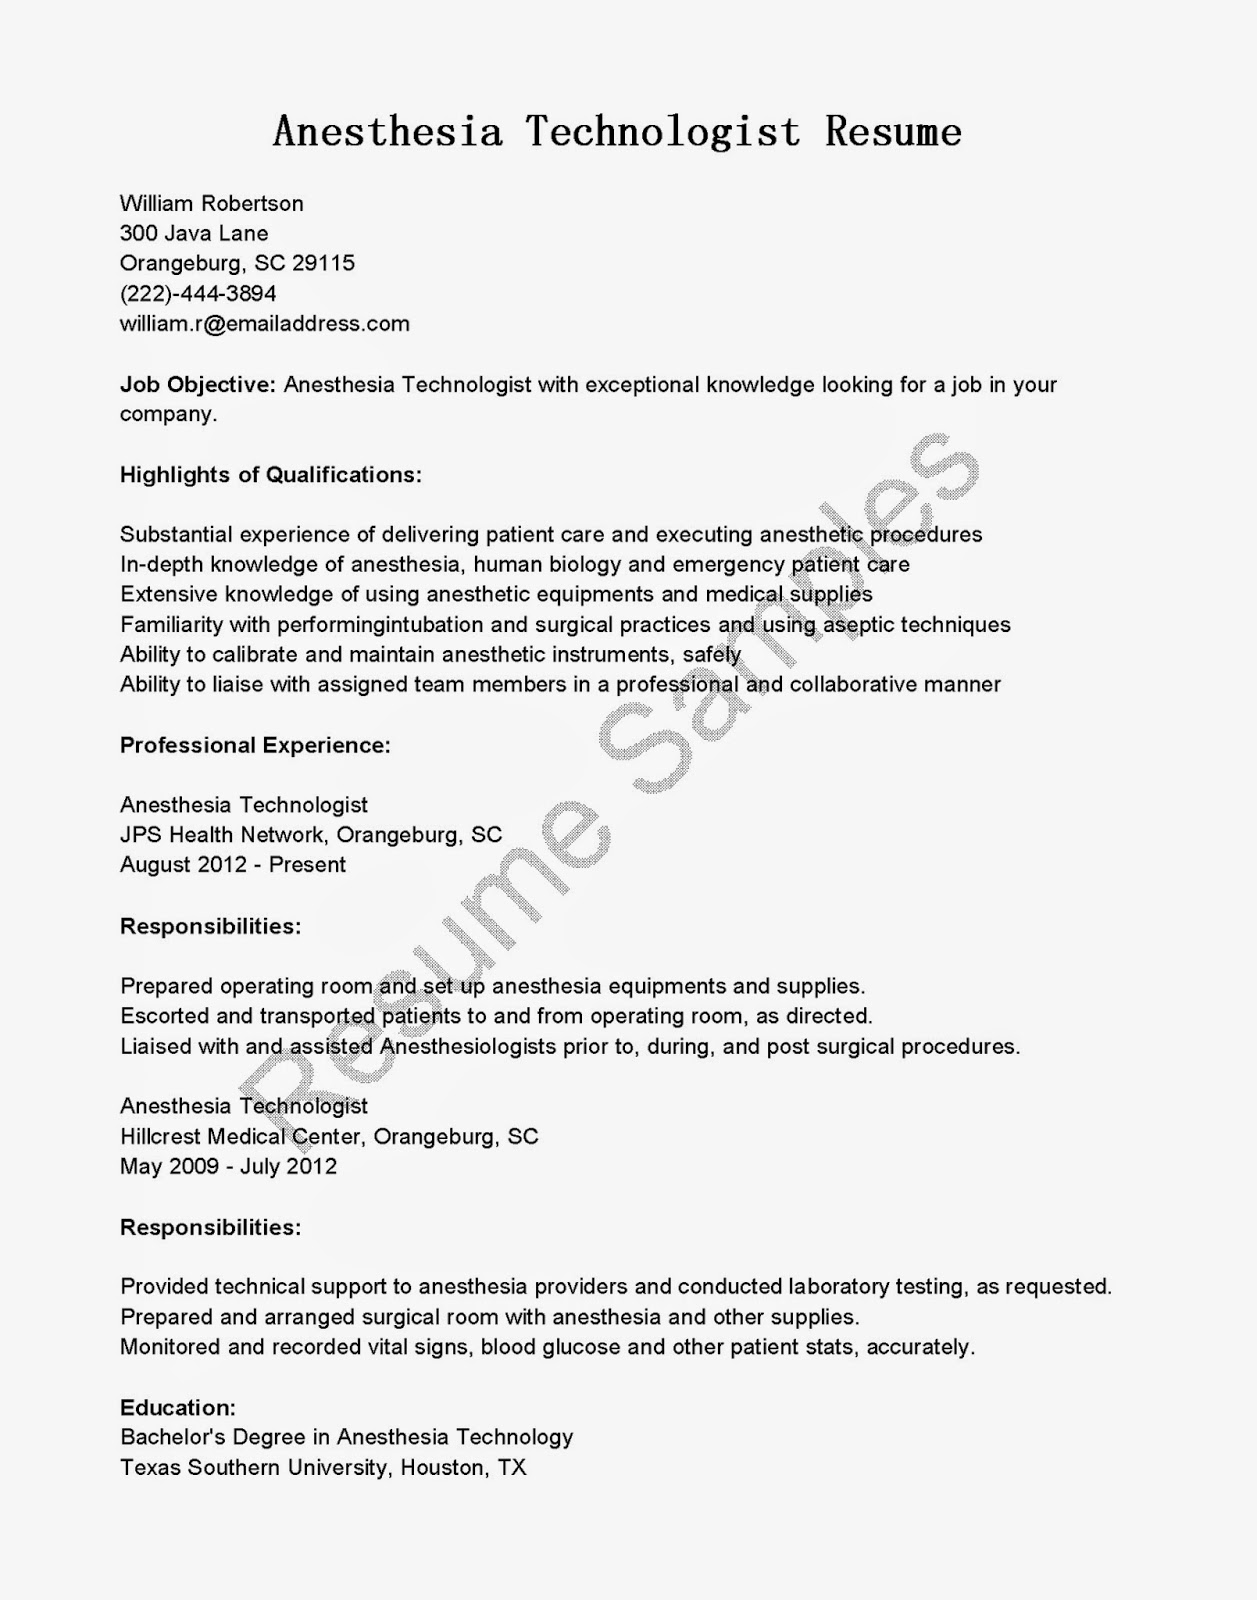 Cover Letter For Resume Radiologic Technologist Radiologic Technologist Thank You Letter X Ray Resume Samples Anesthesia Technologist Resume Sample